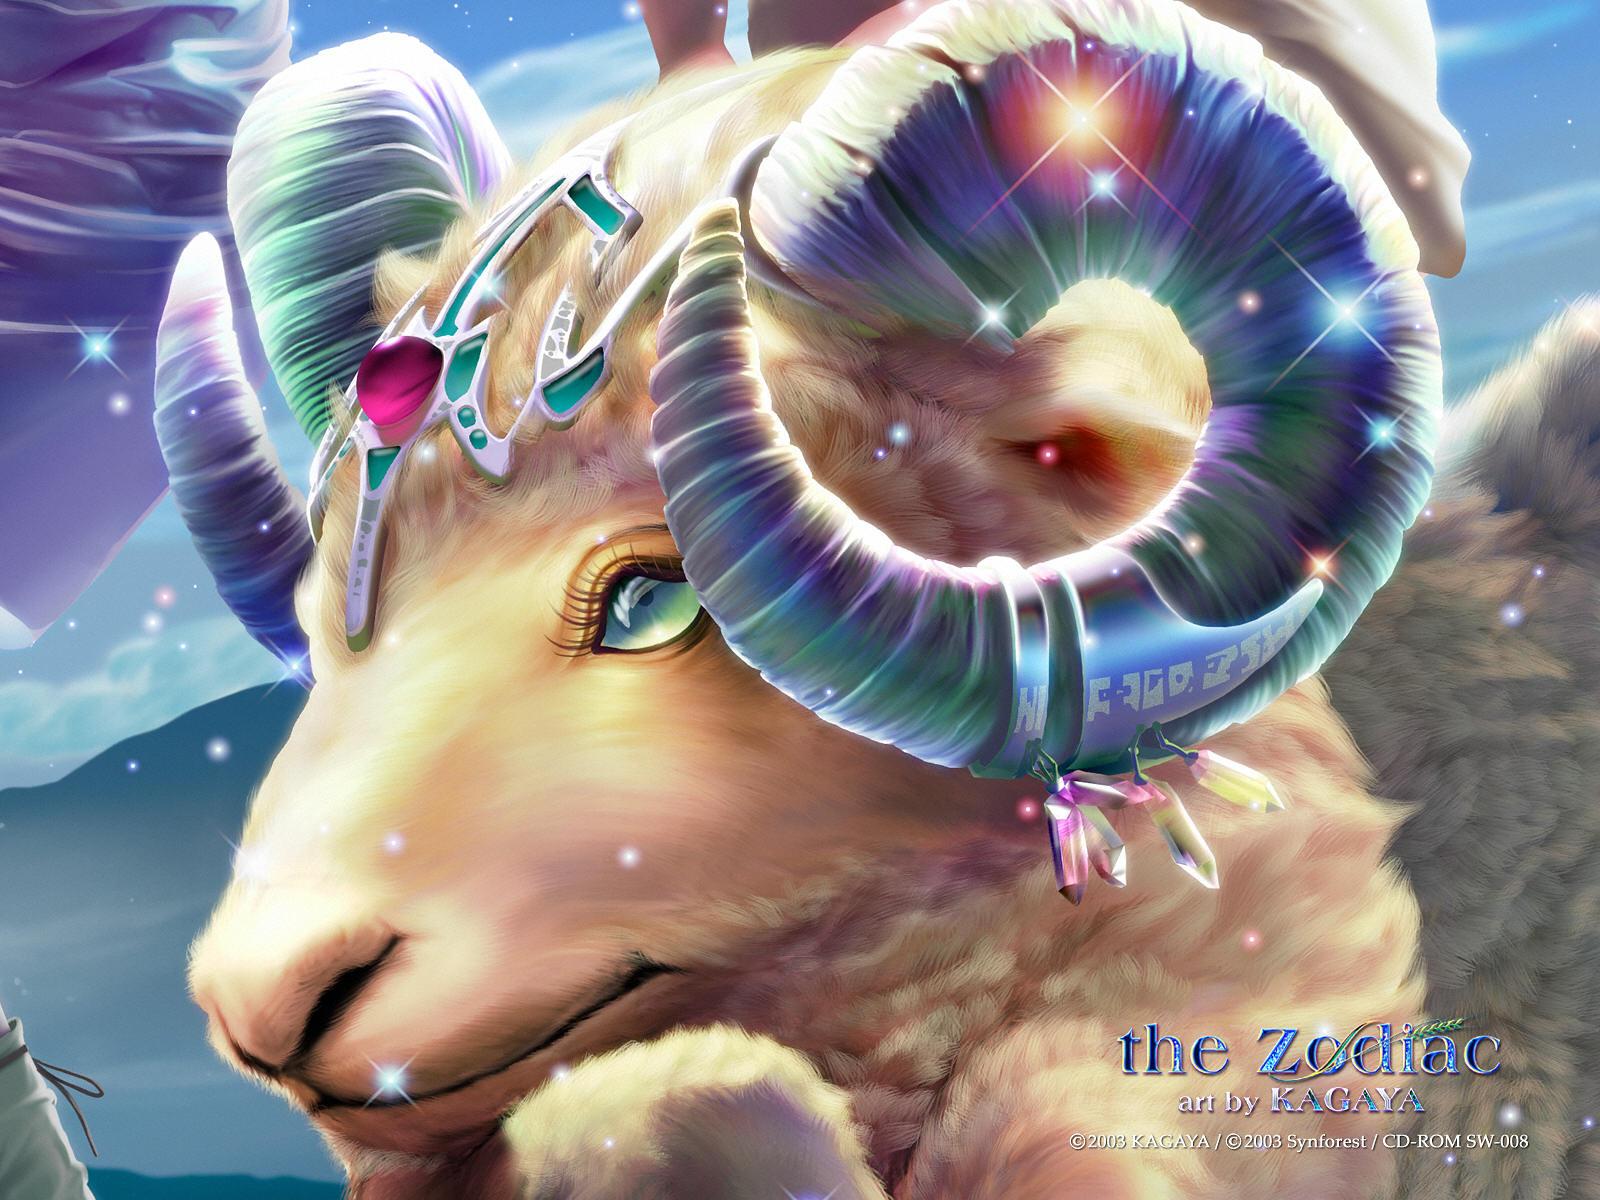 Download HQ Aries The Zodiac wallpaper / 1600x1200